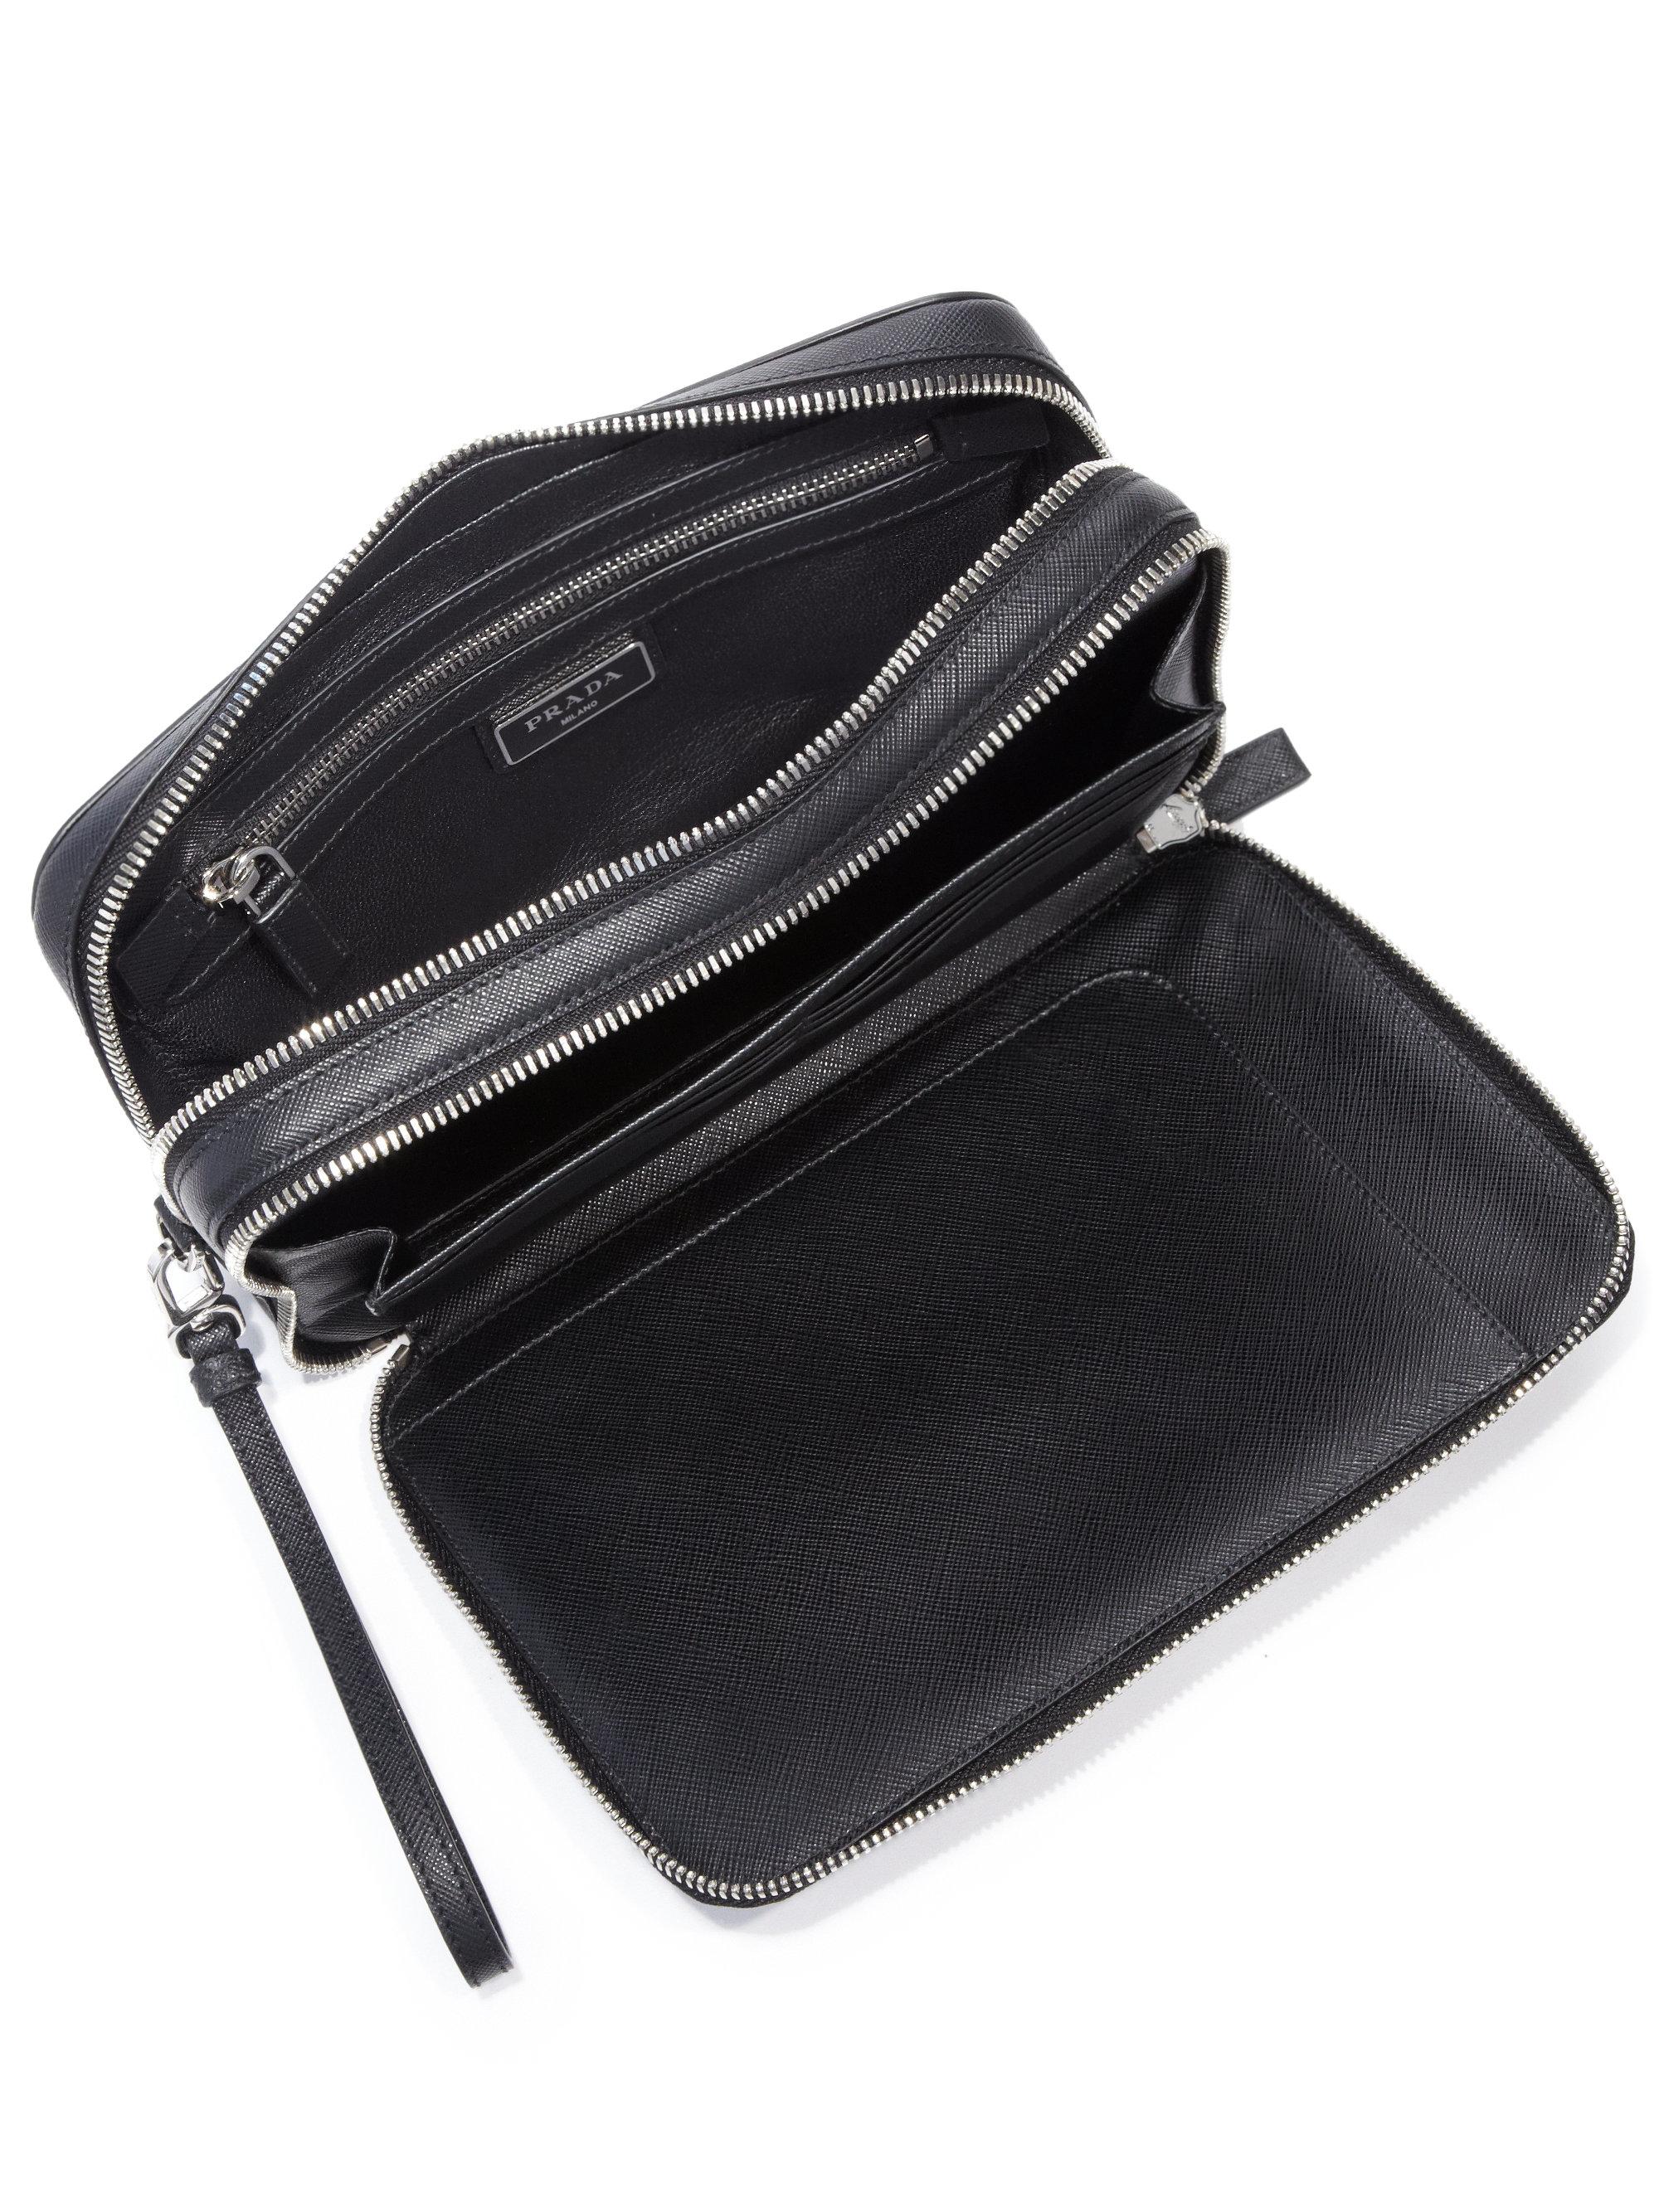 60e7056d5c4803 ... closeout lyst prada saffiano leather travel wallet in black for men  9c66e 816b2